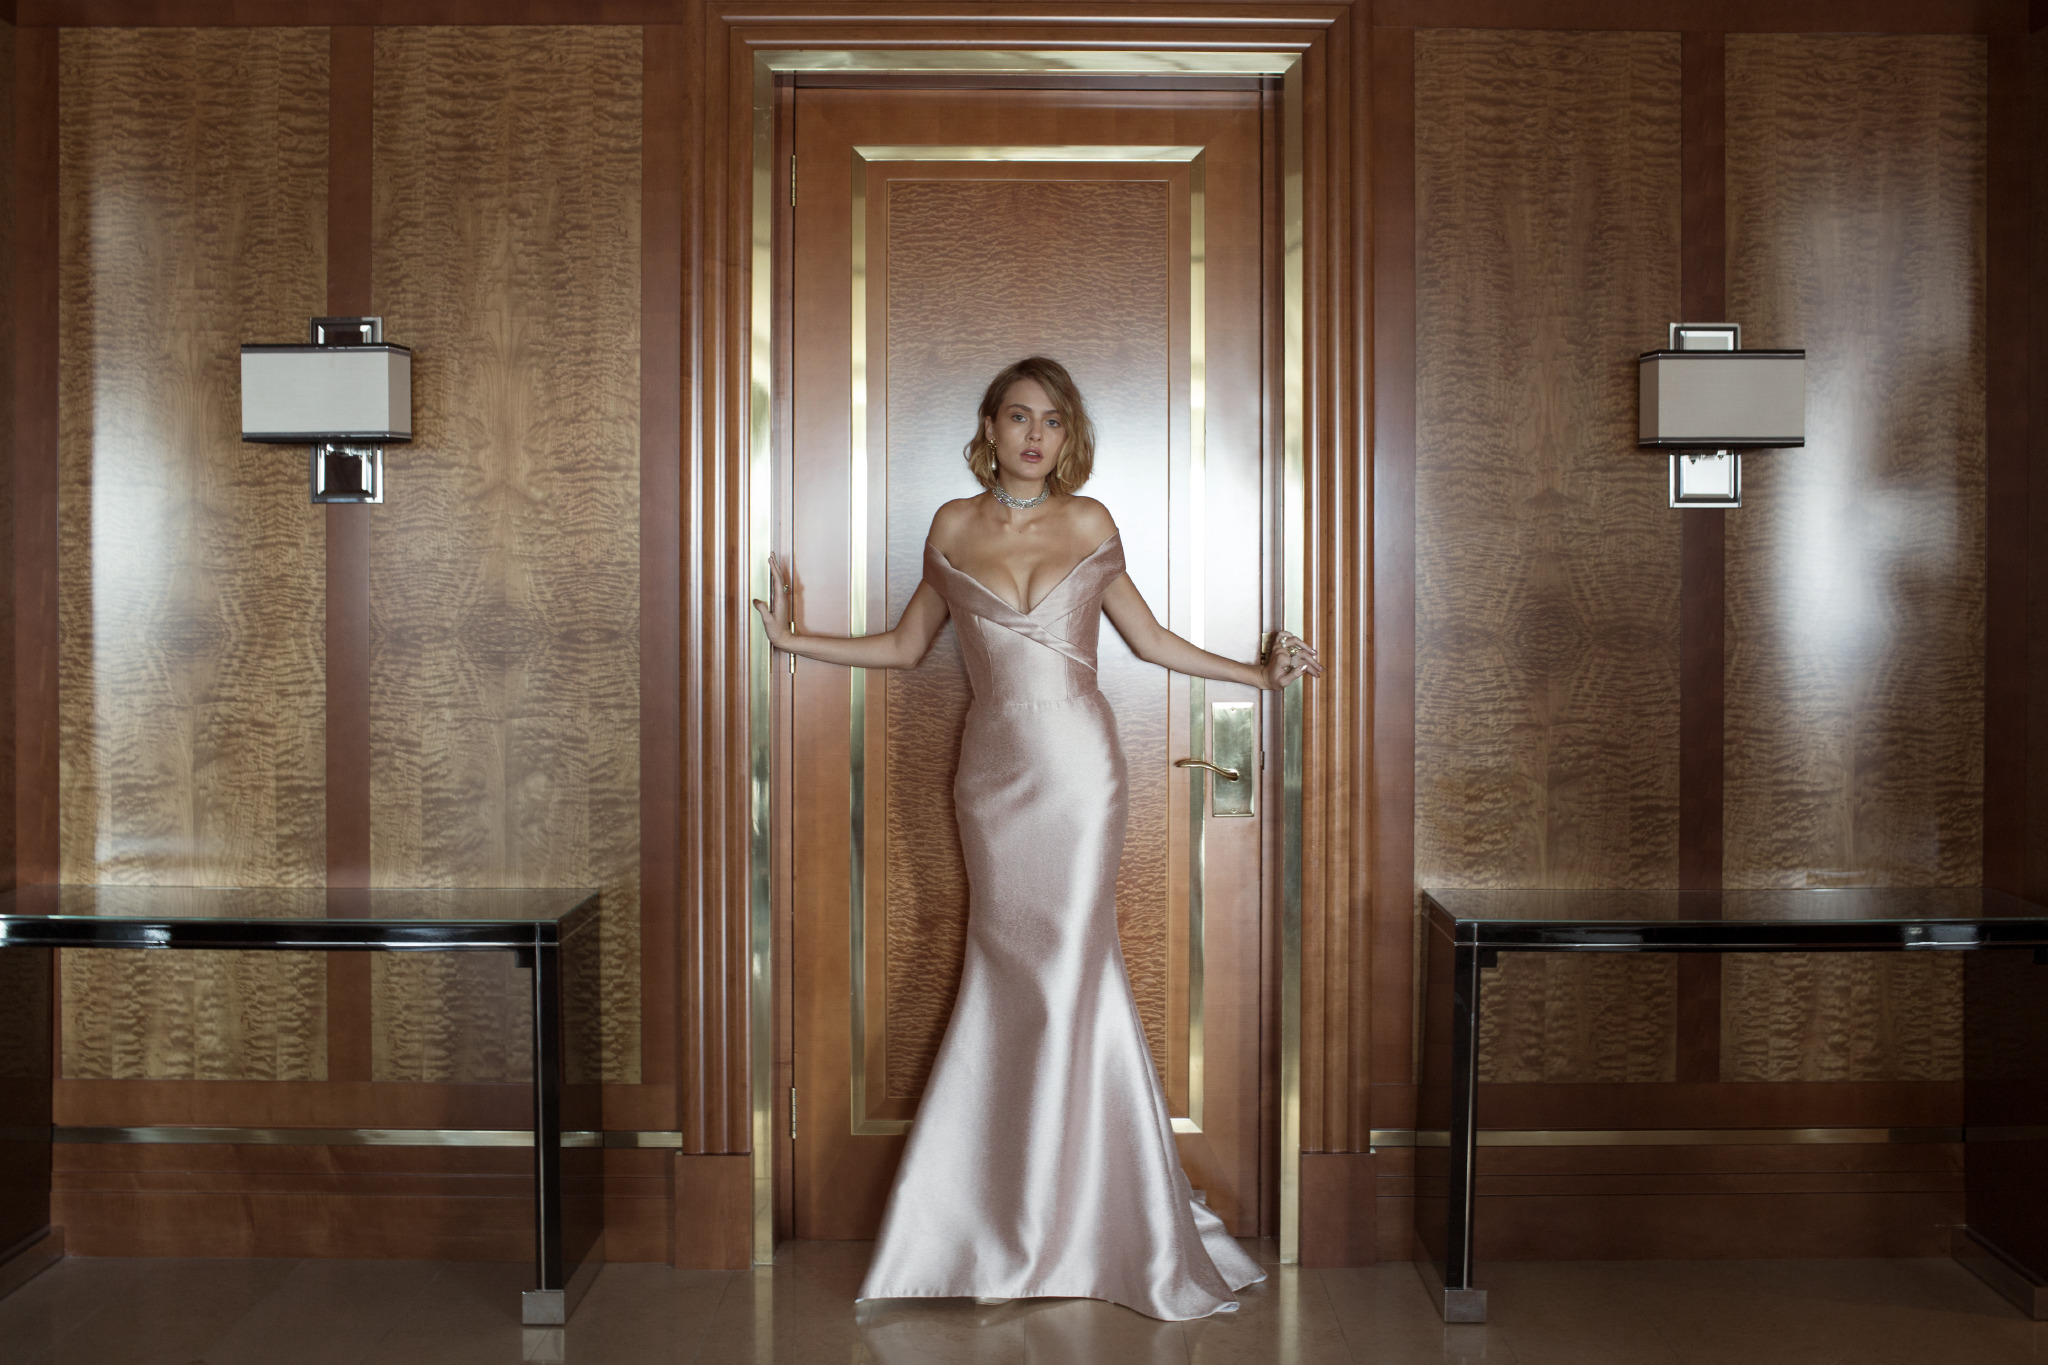 onedaybridal-1985-wedding-dress-collection-mavis-2_preview.jpeg